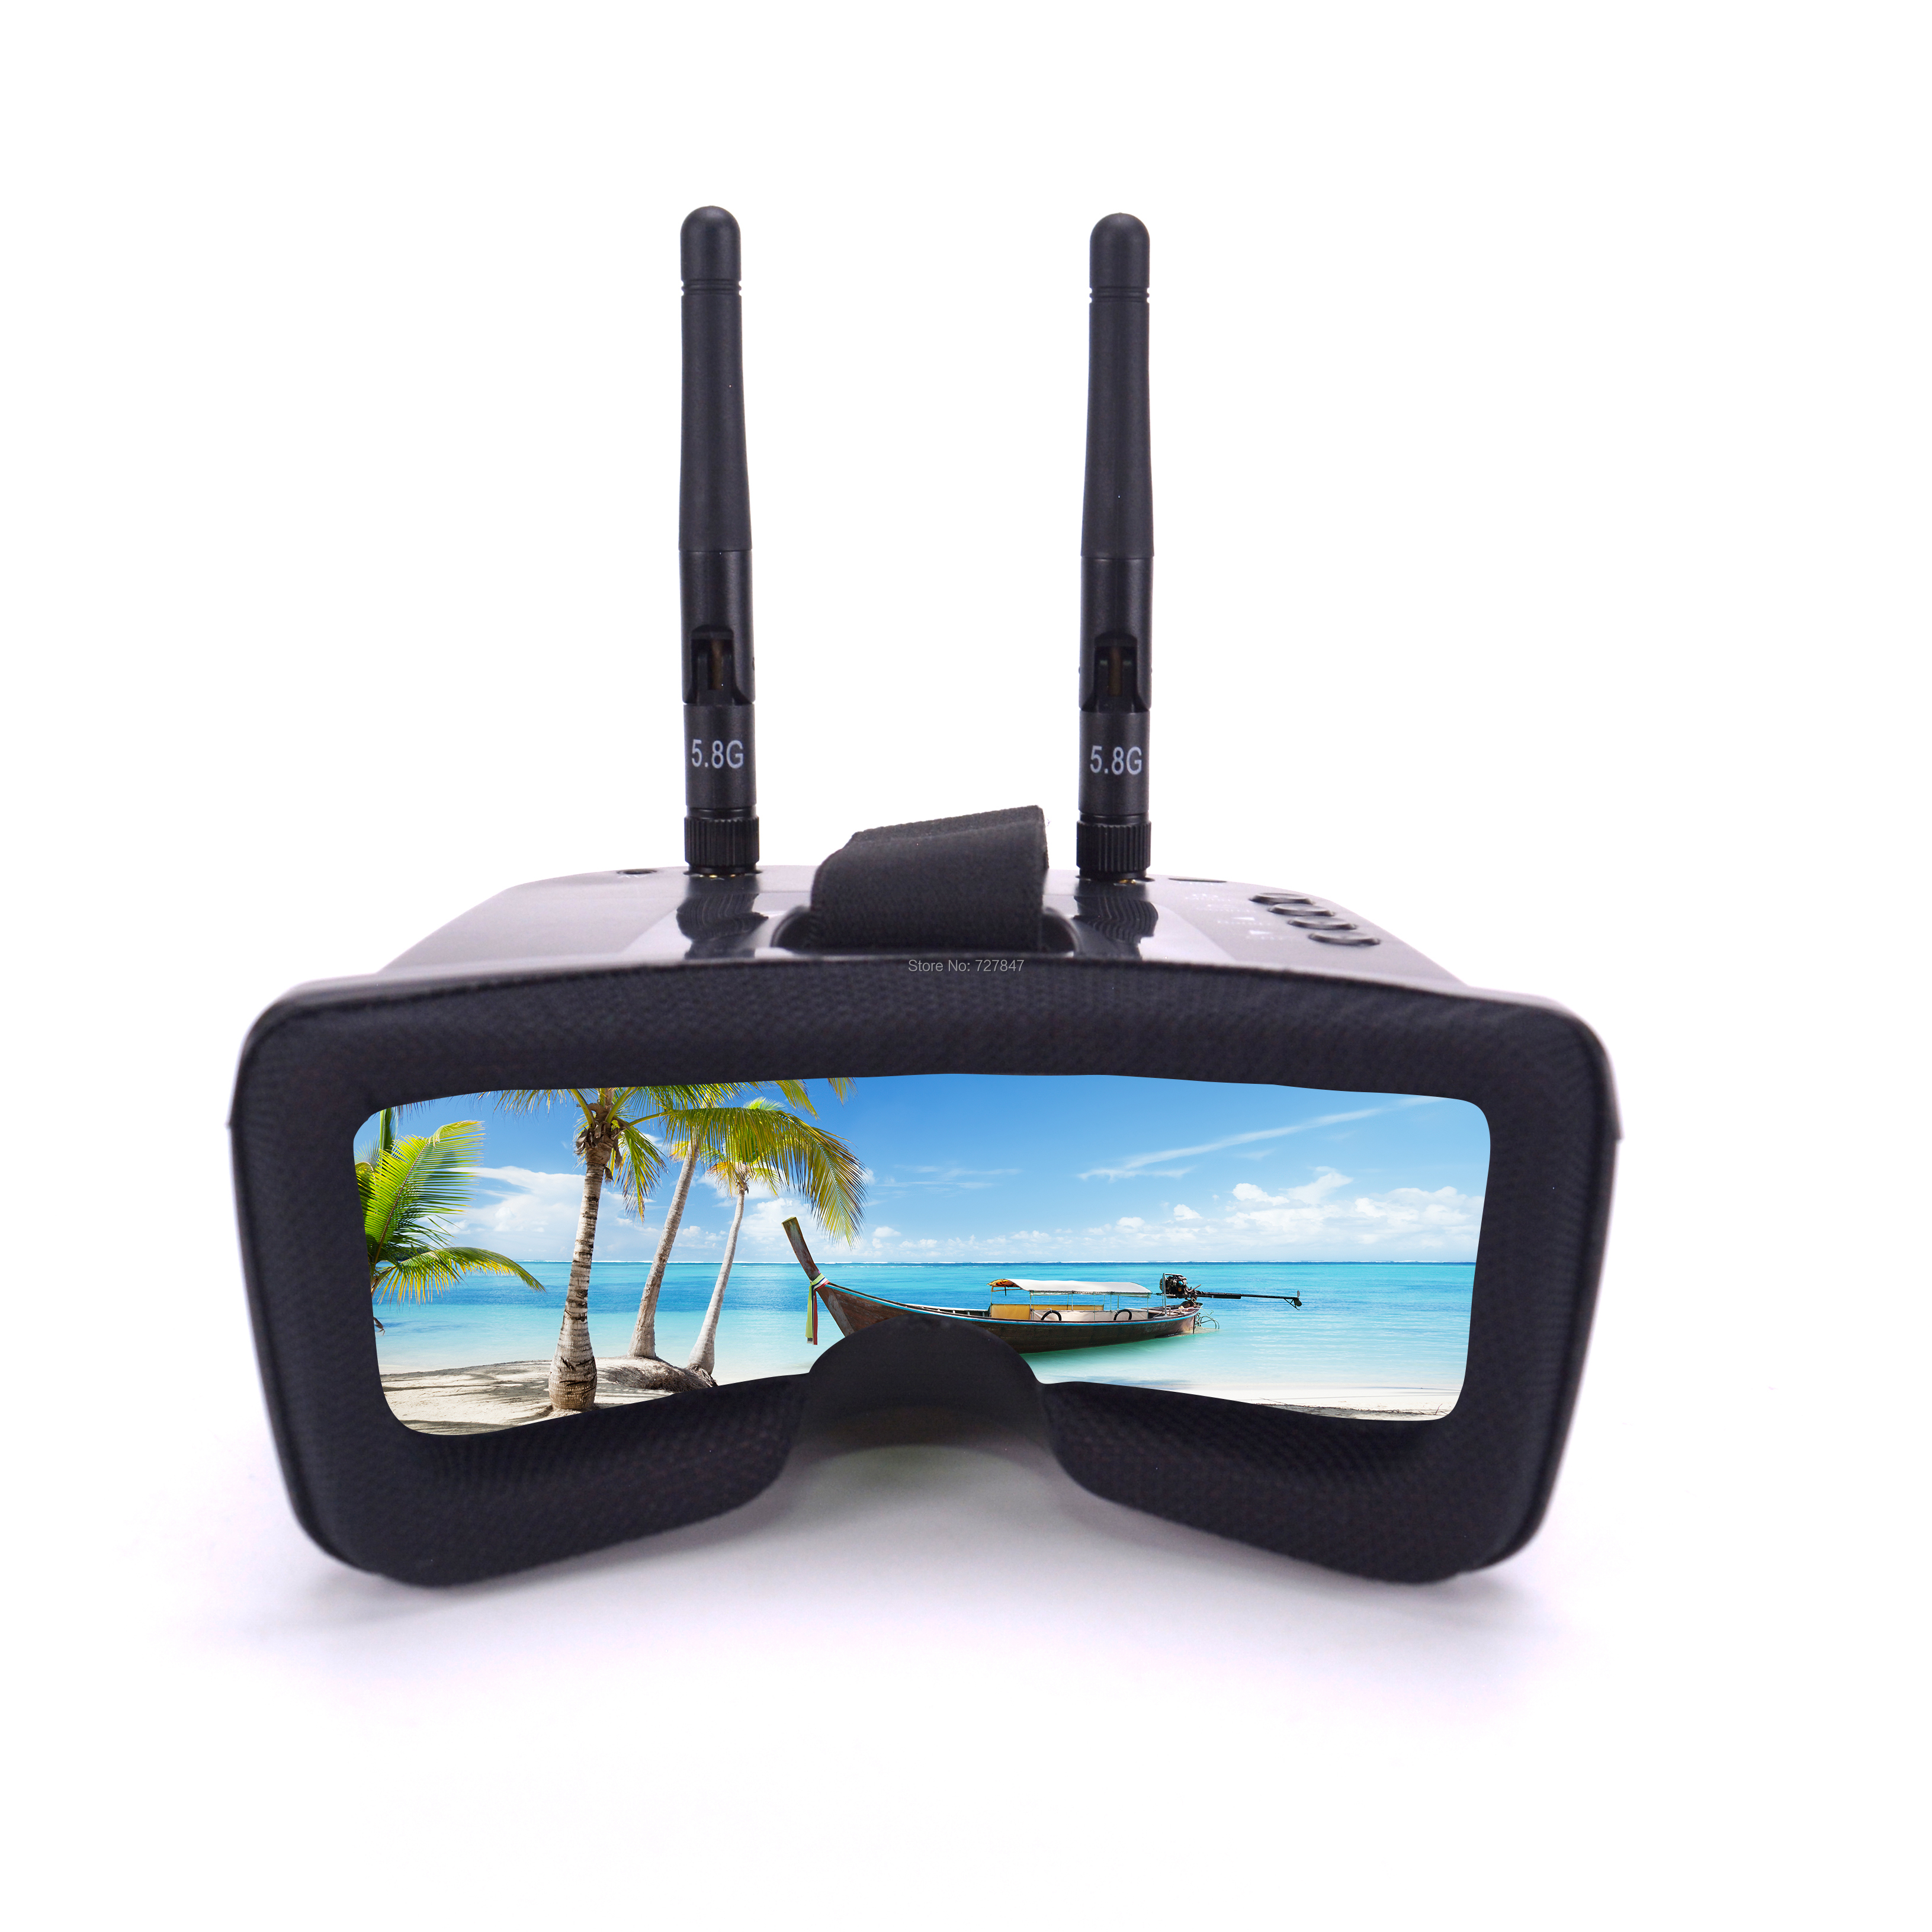 3inch 480*320 Display 5.8G 40 CH Mini FPV Goggles Built-In 3.7V 1200mAh Battery